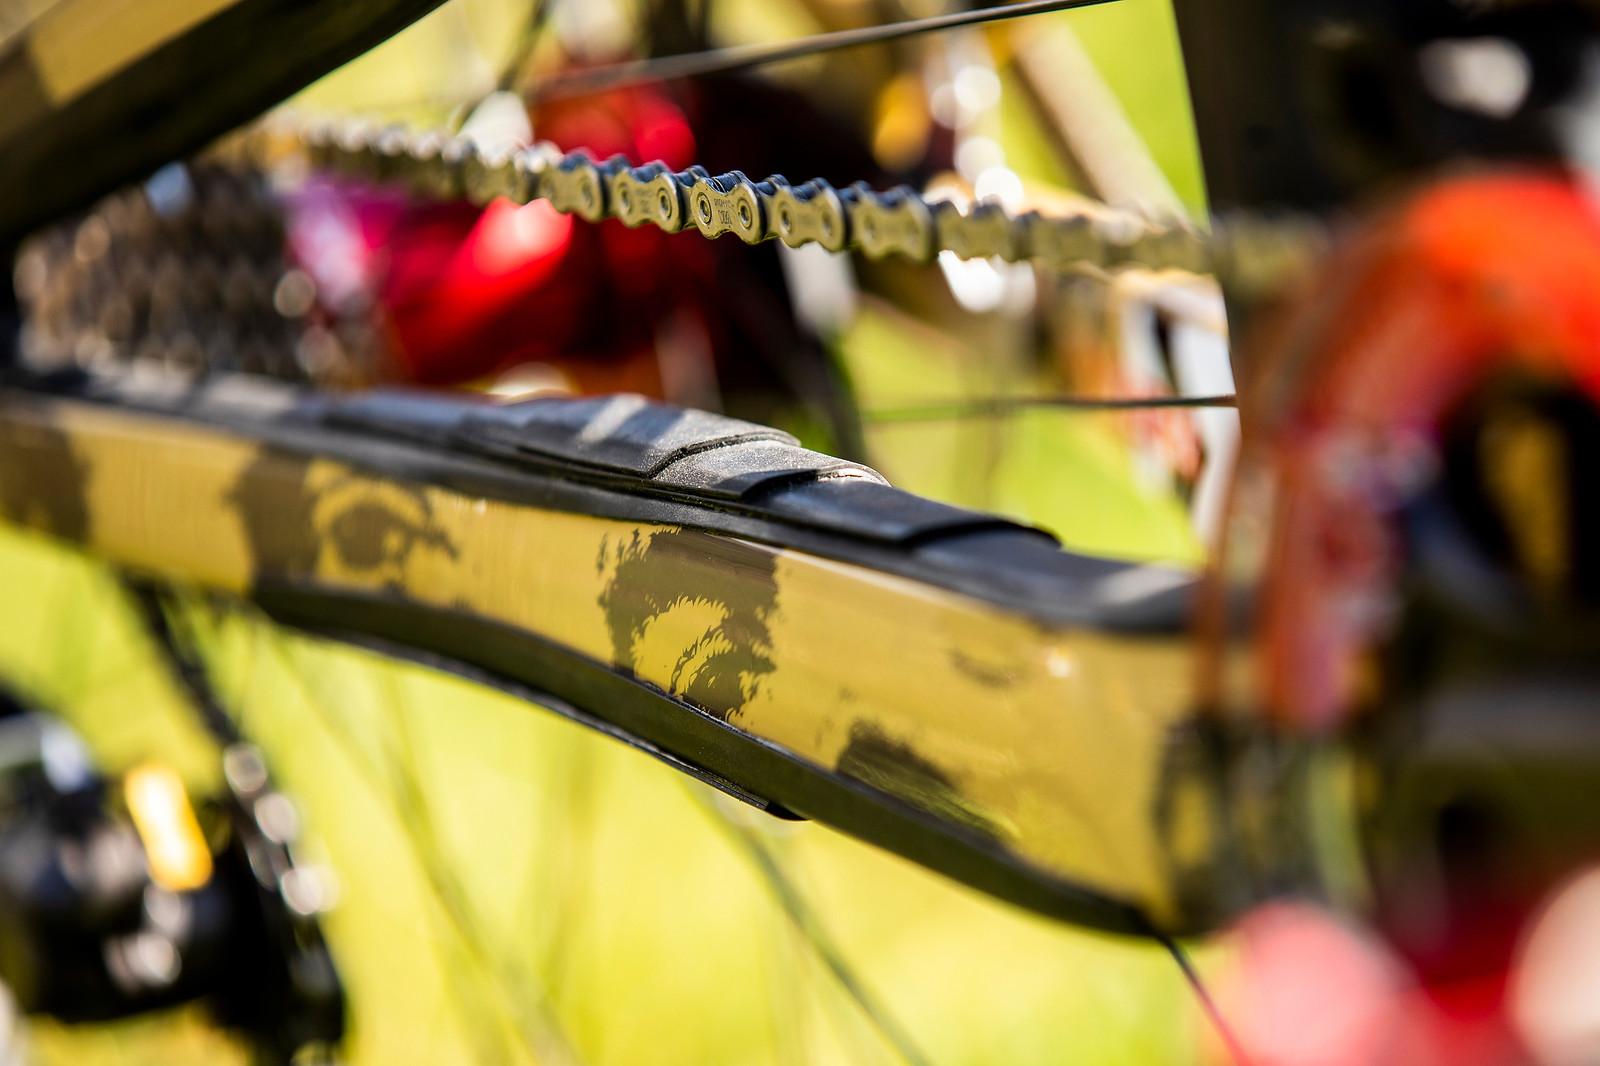 Keep It Down in There - WORLD CHAMPS BIKE - Greg Minnaar's Santa Cruz V10 - Mountain Biking Pictures - Vital MTB